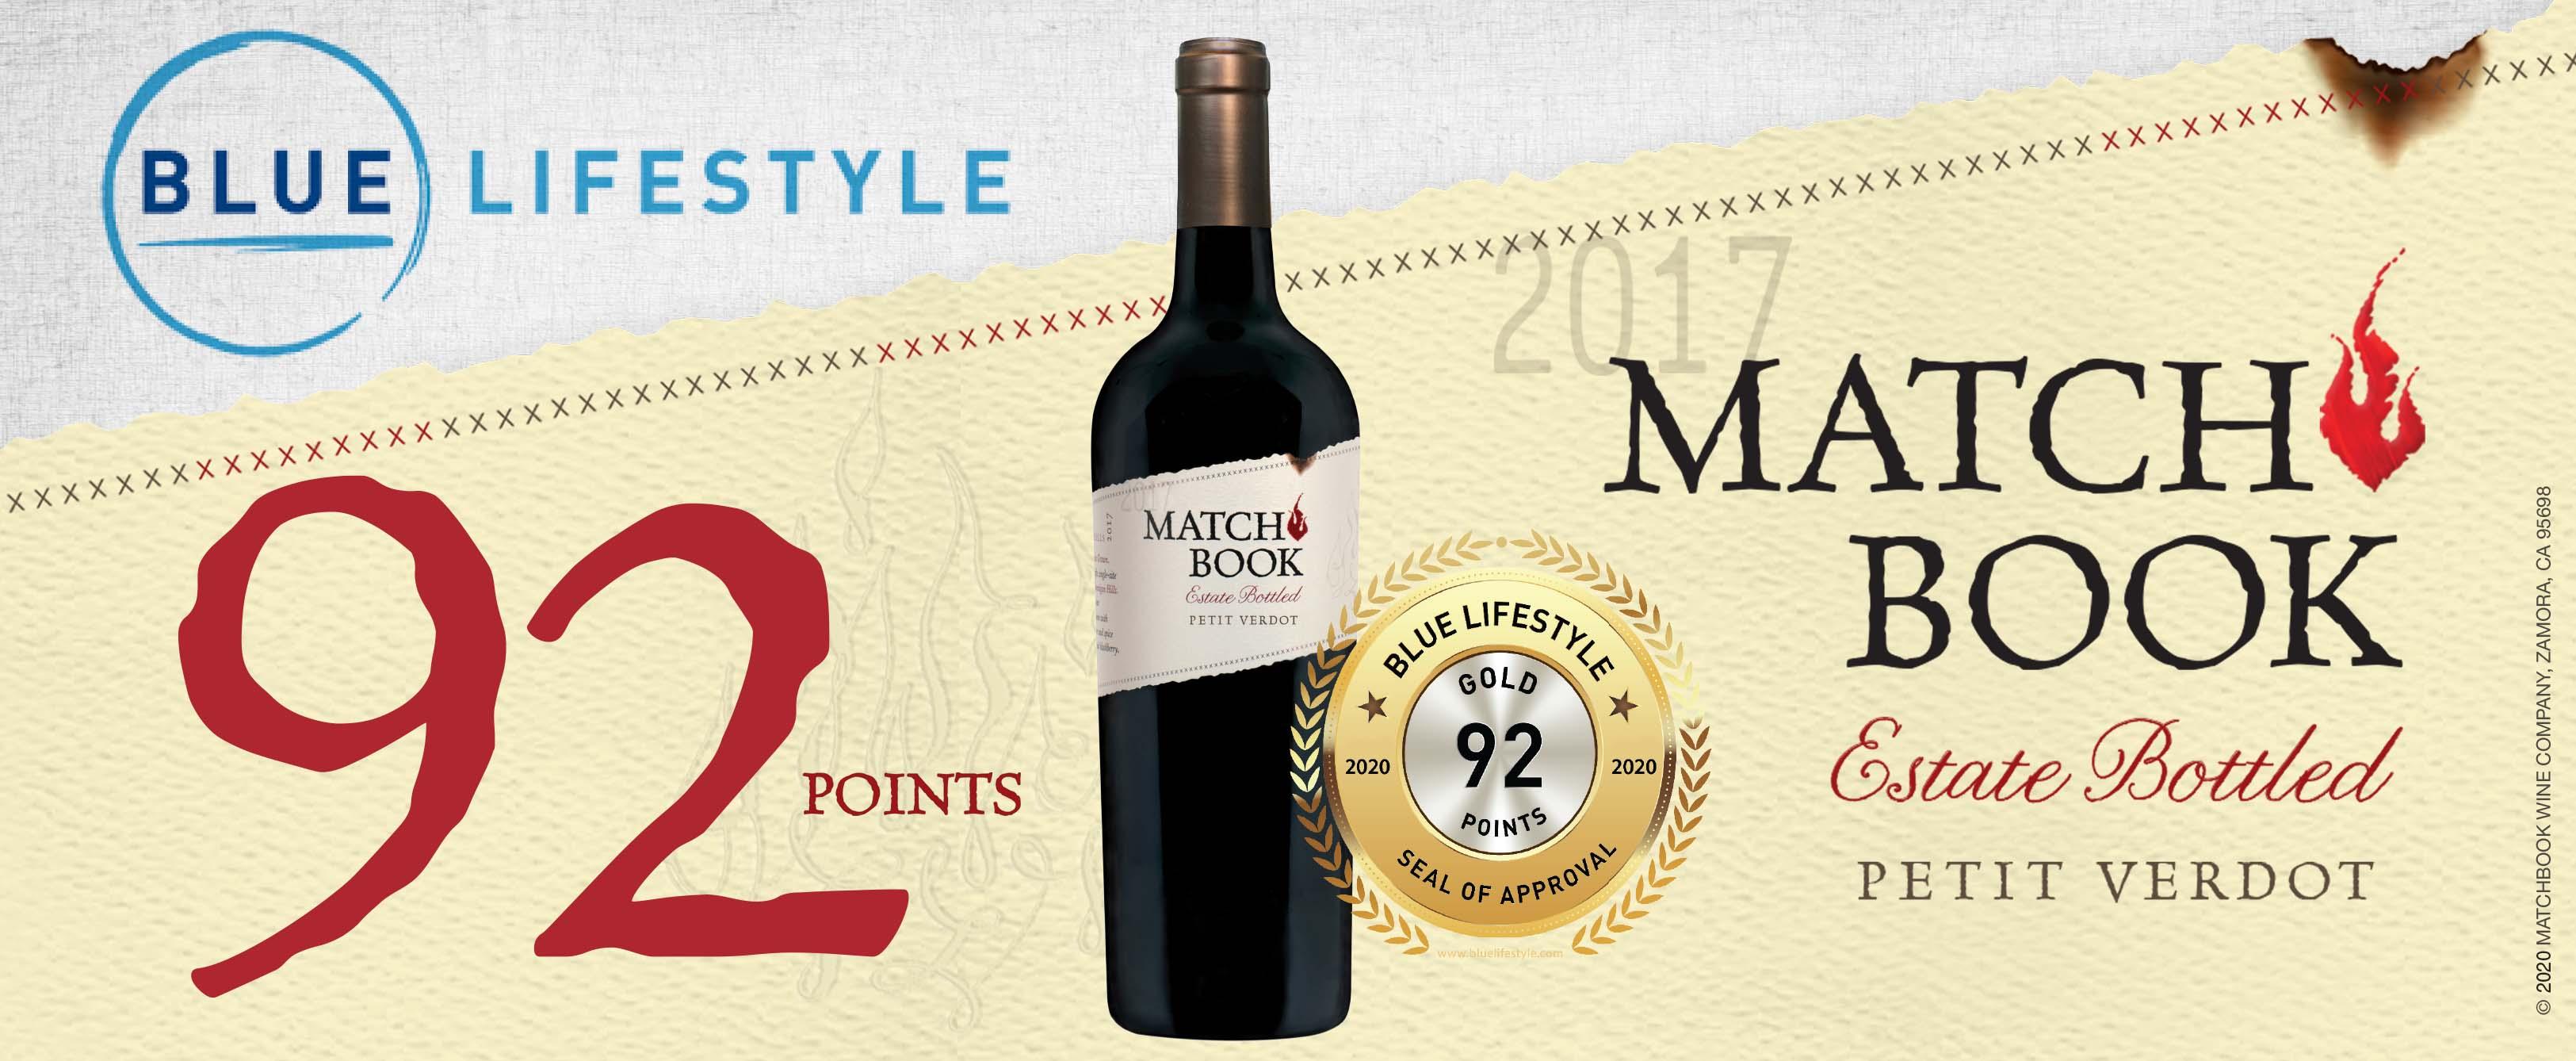 Best Winery Daily Democrat